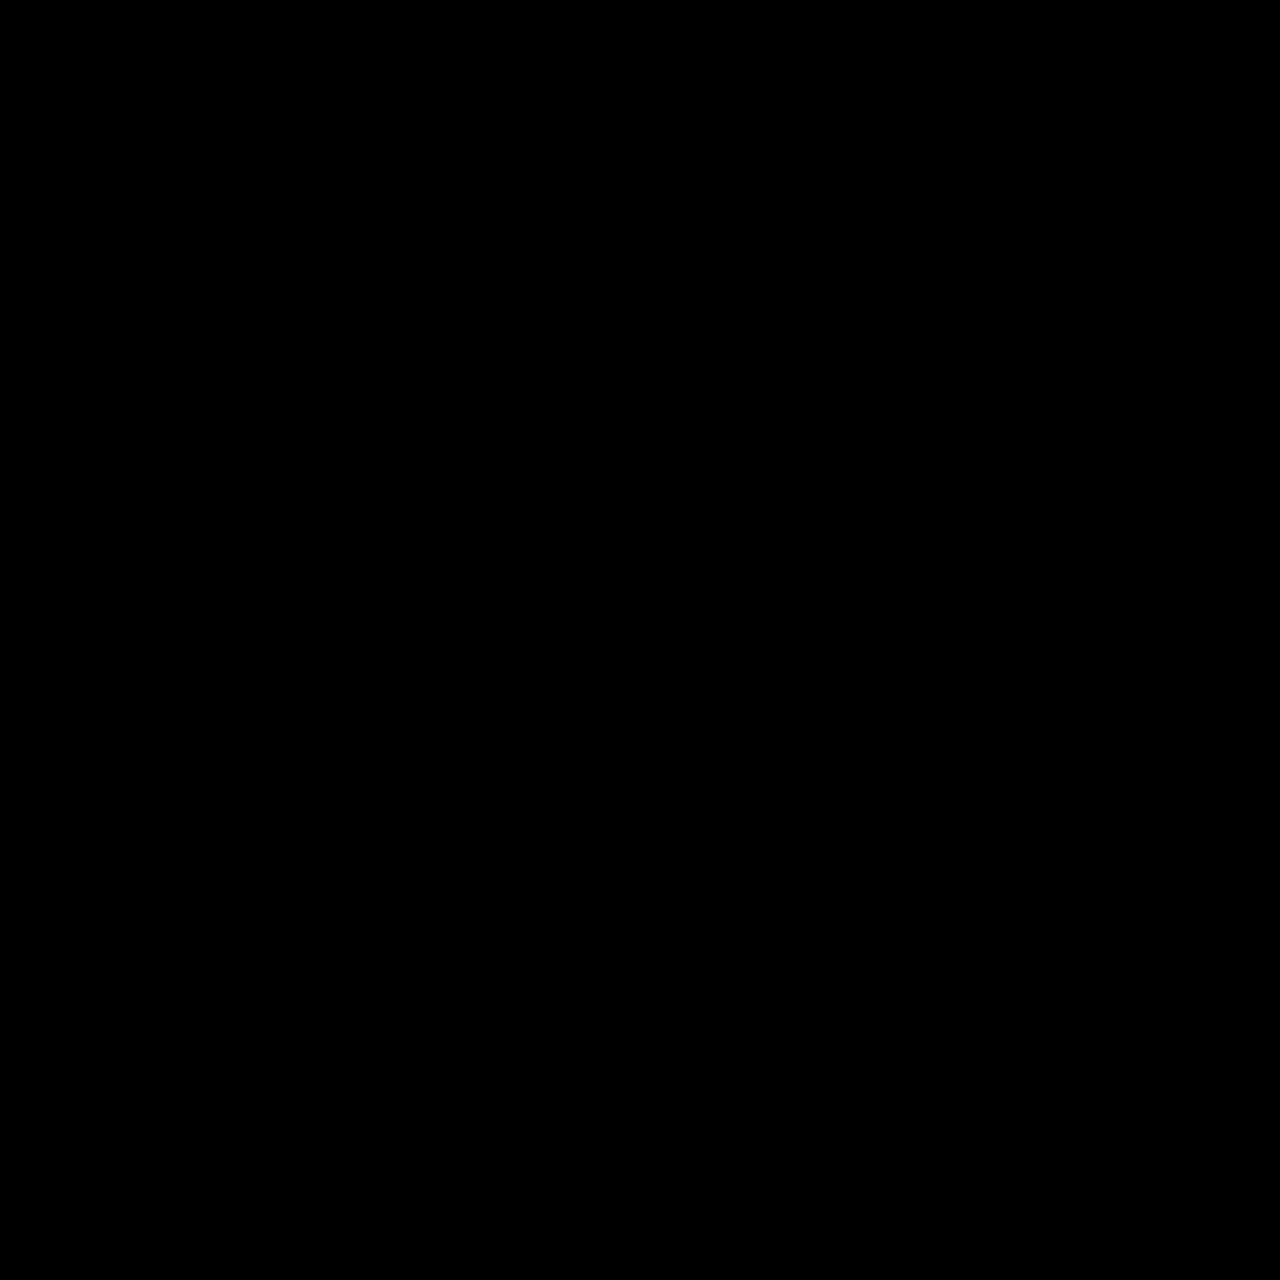 Black Lollies